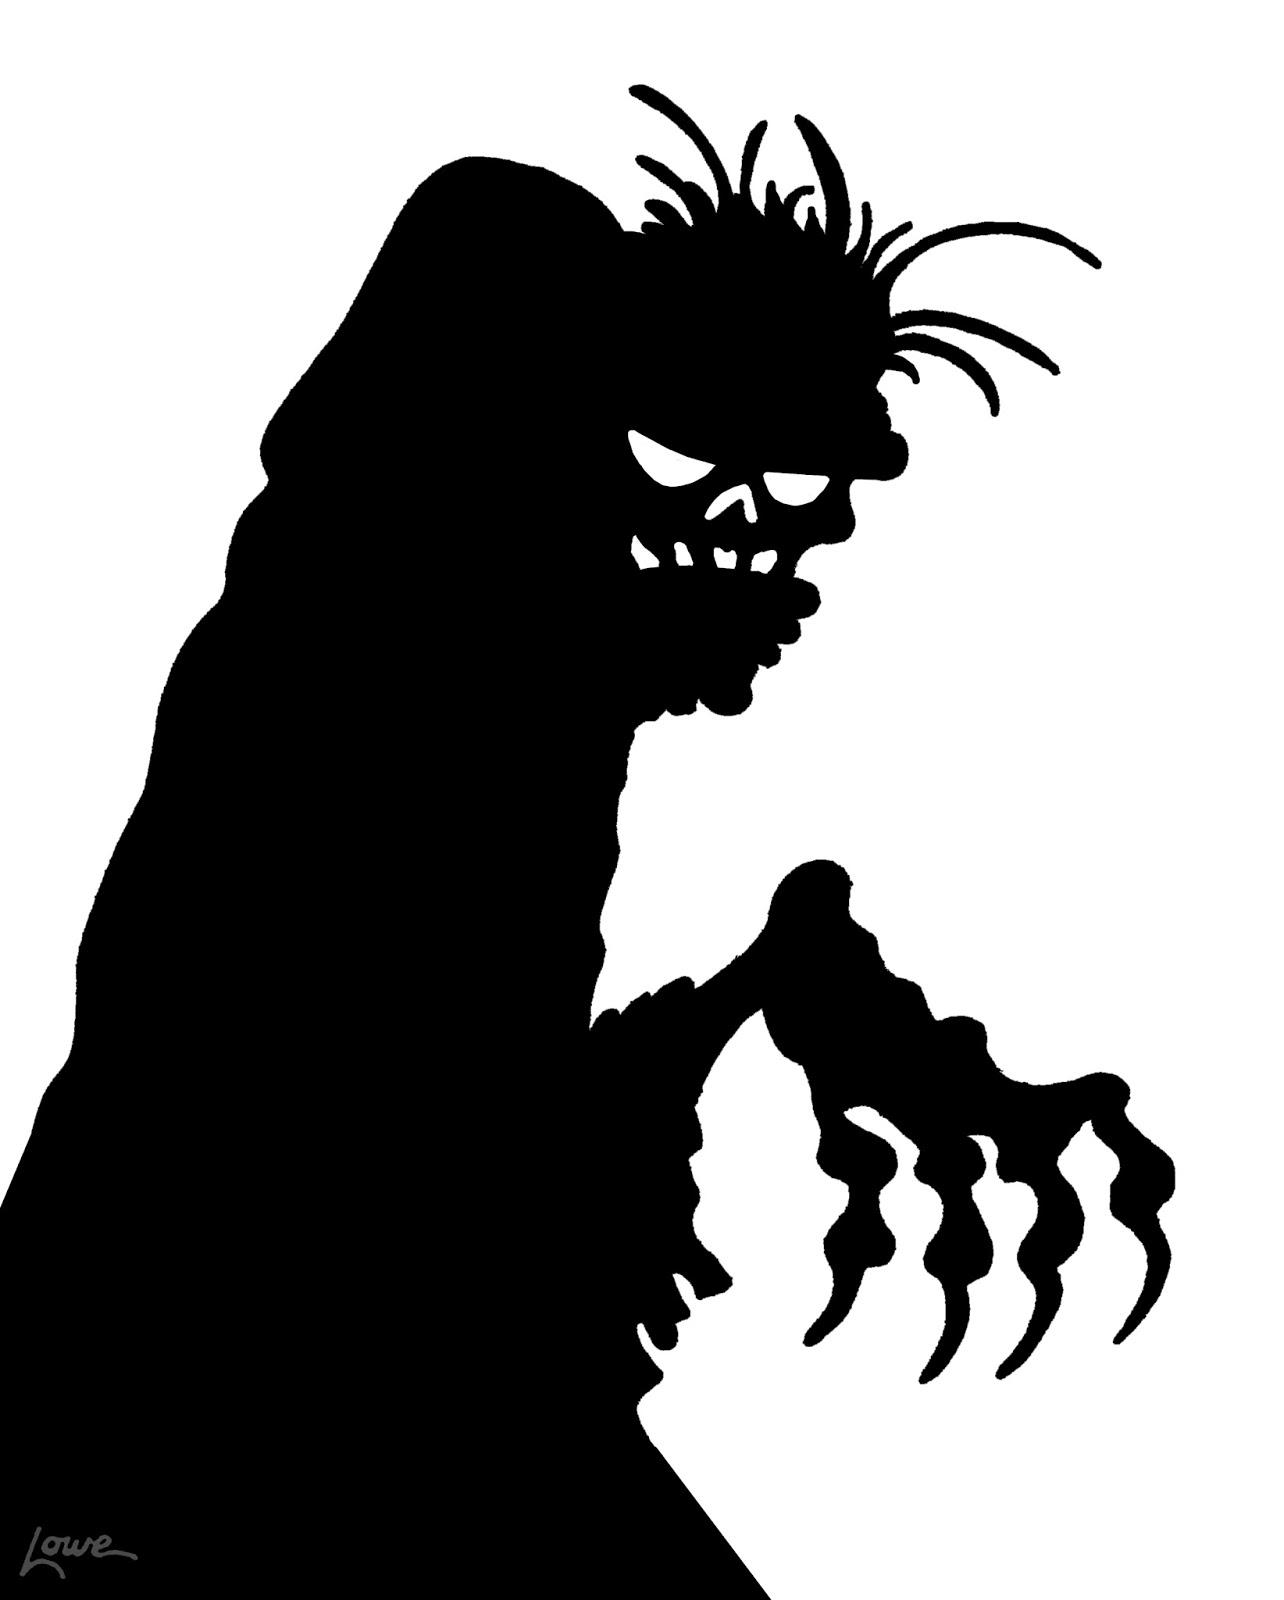 Dave Lowe Design The Blog 63 Days Til Halloween Zombie